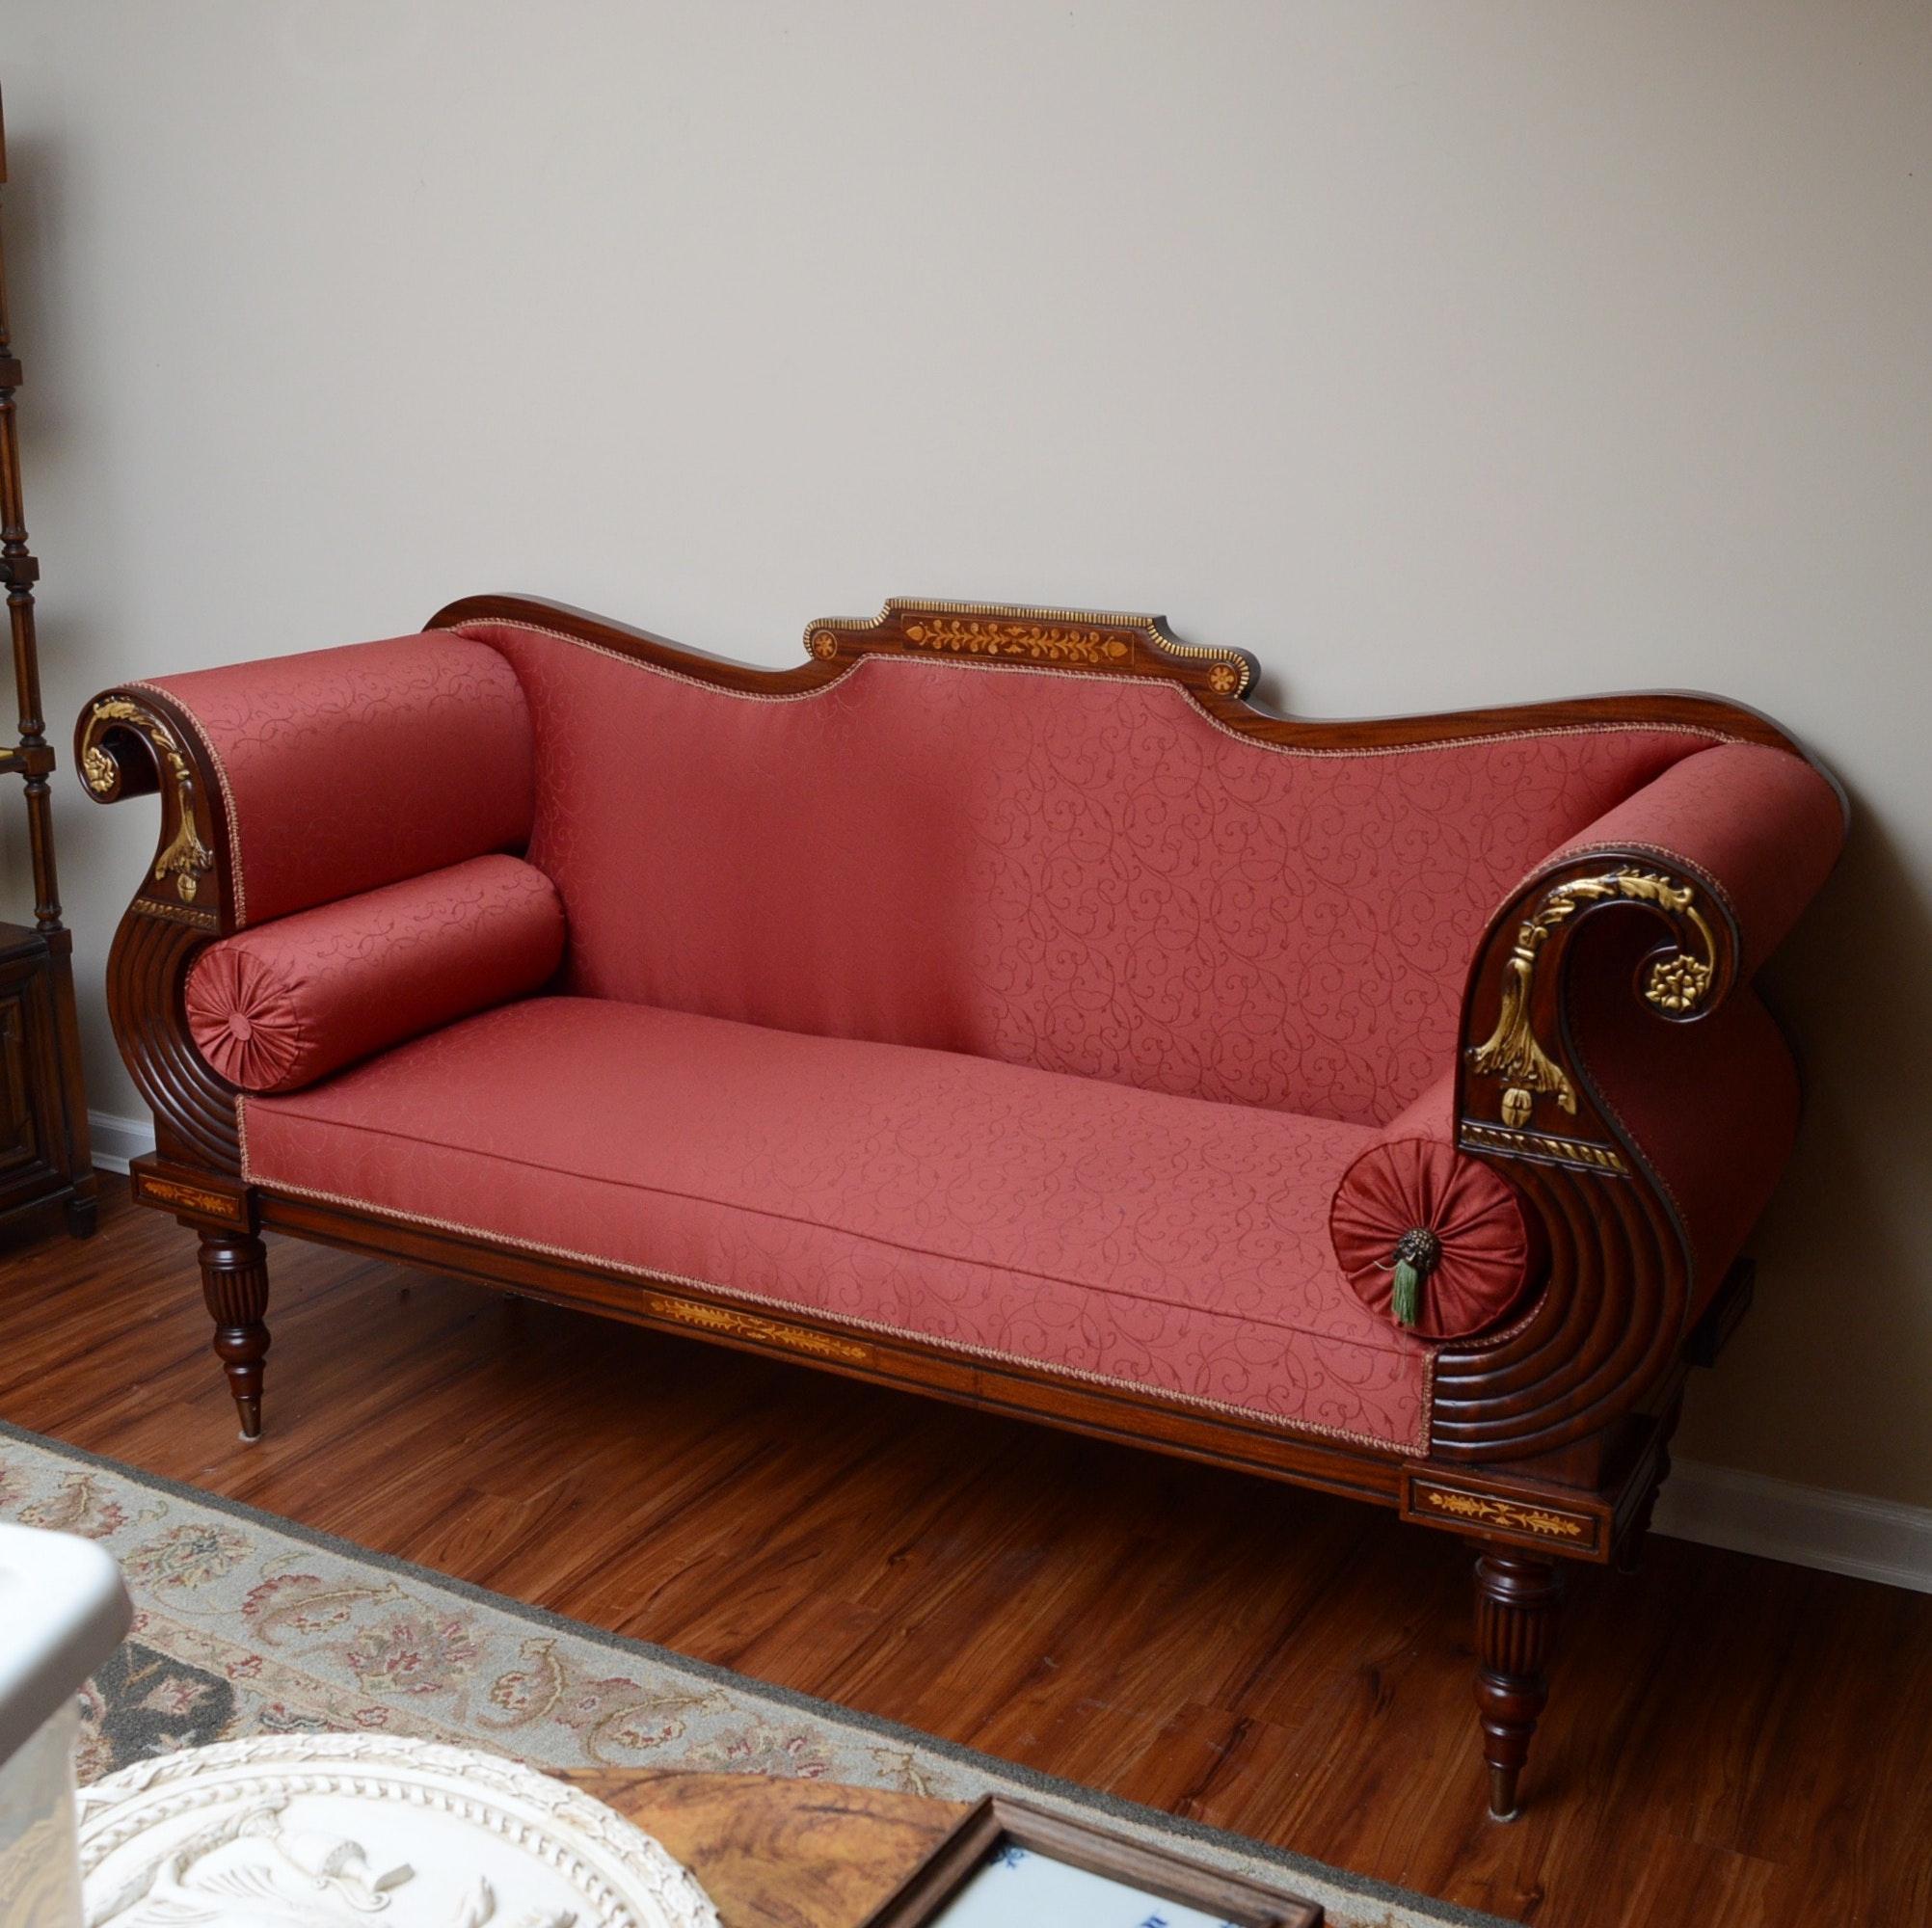 Wonderful Clossonu0027s Empire Style Sofa ...